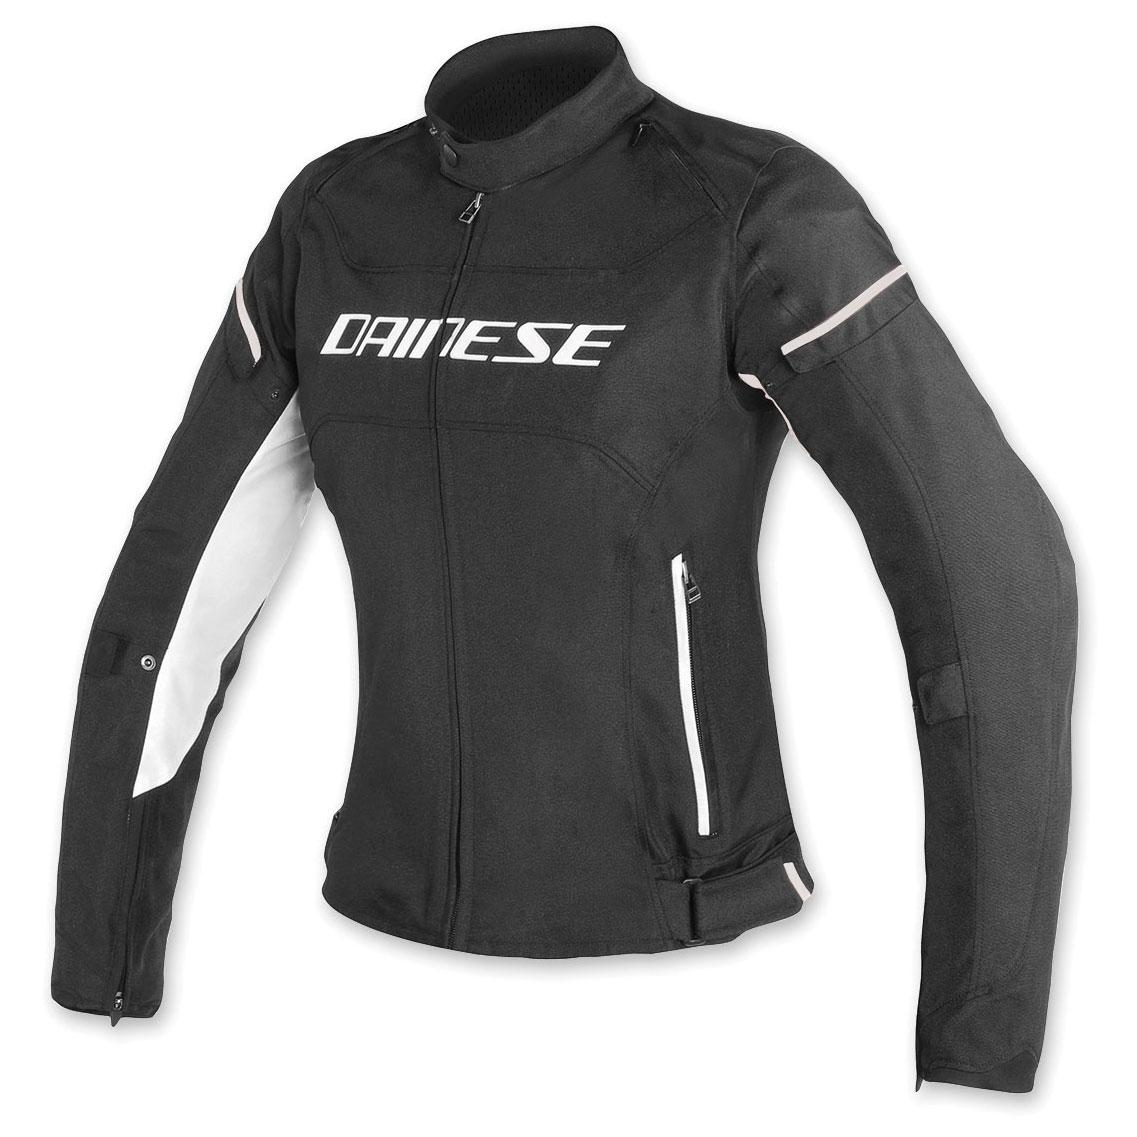 Dainese Women's D-Frame Black/White Textile Jacket